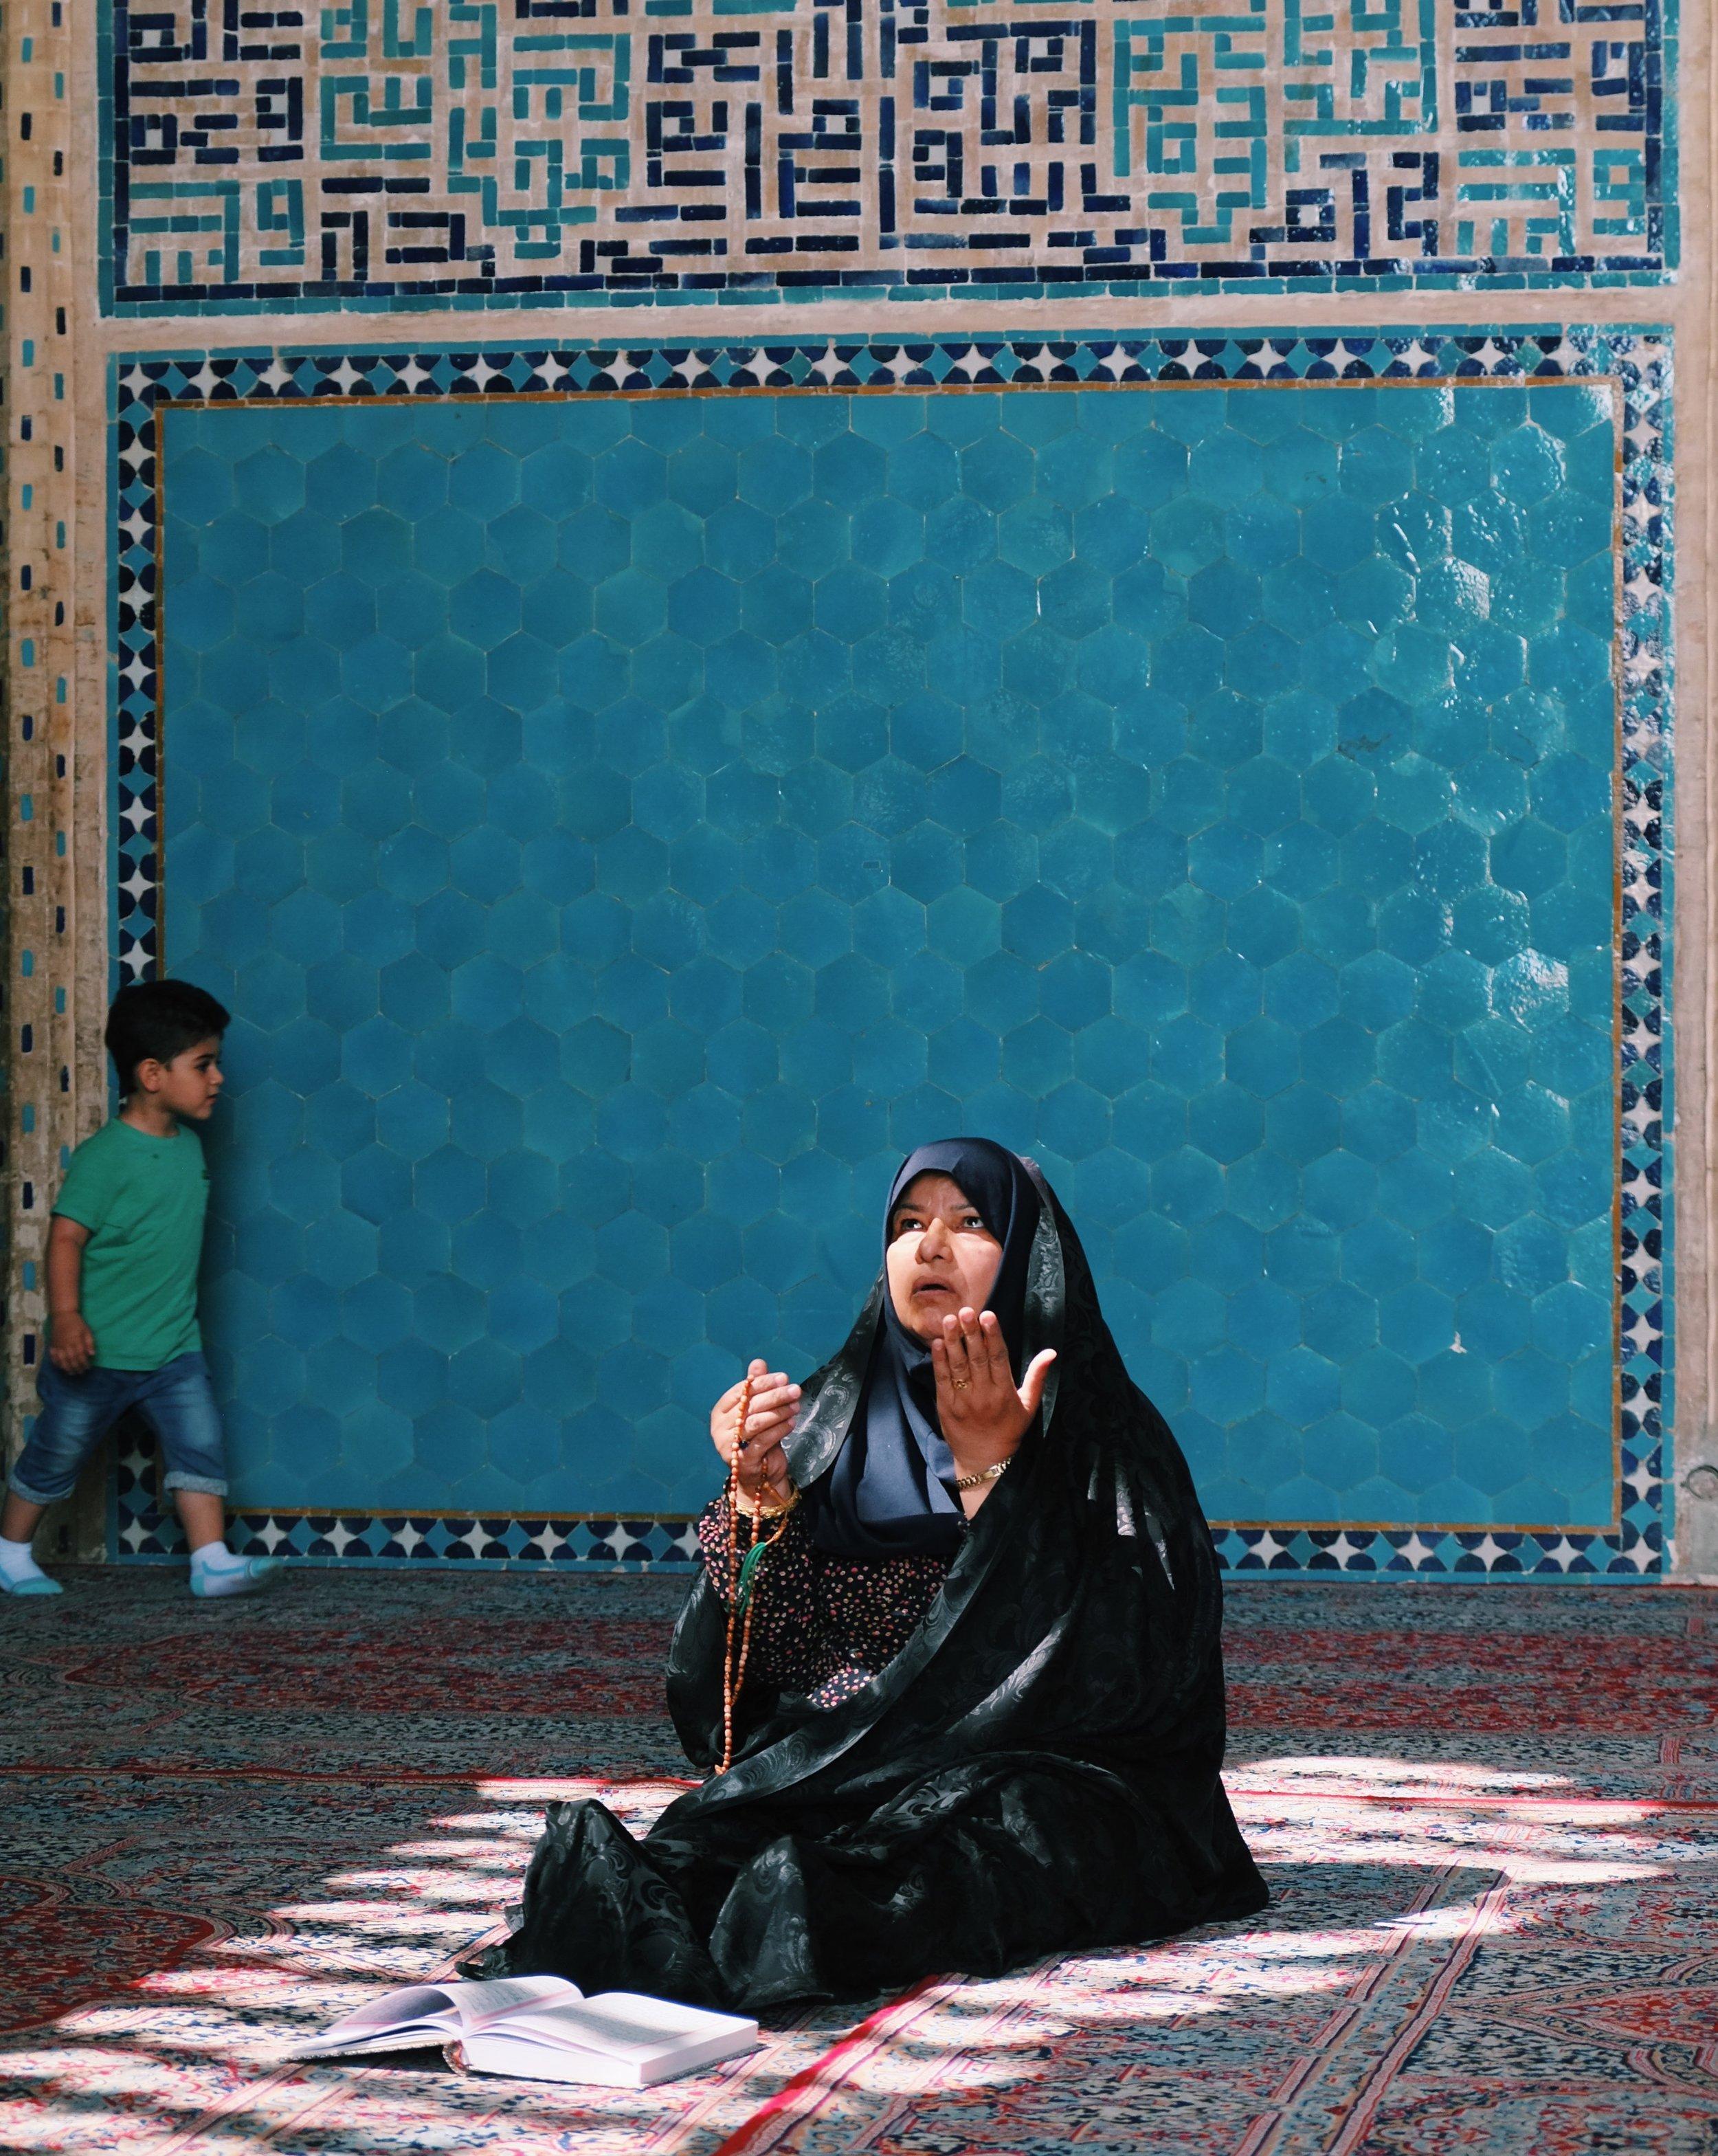 Praying in Yazd Mosque in Iran by Joost Bastmeijer.jpeg